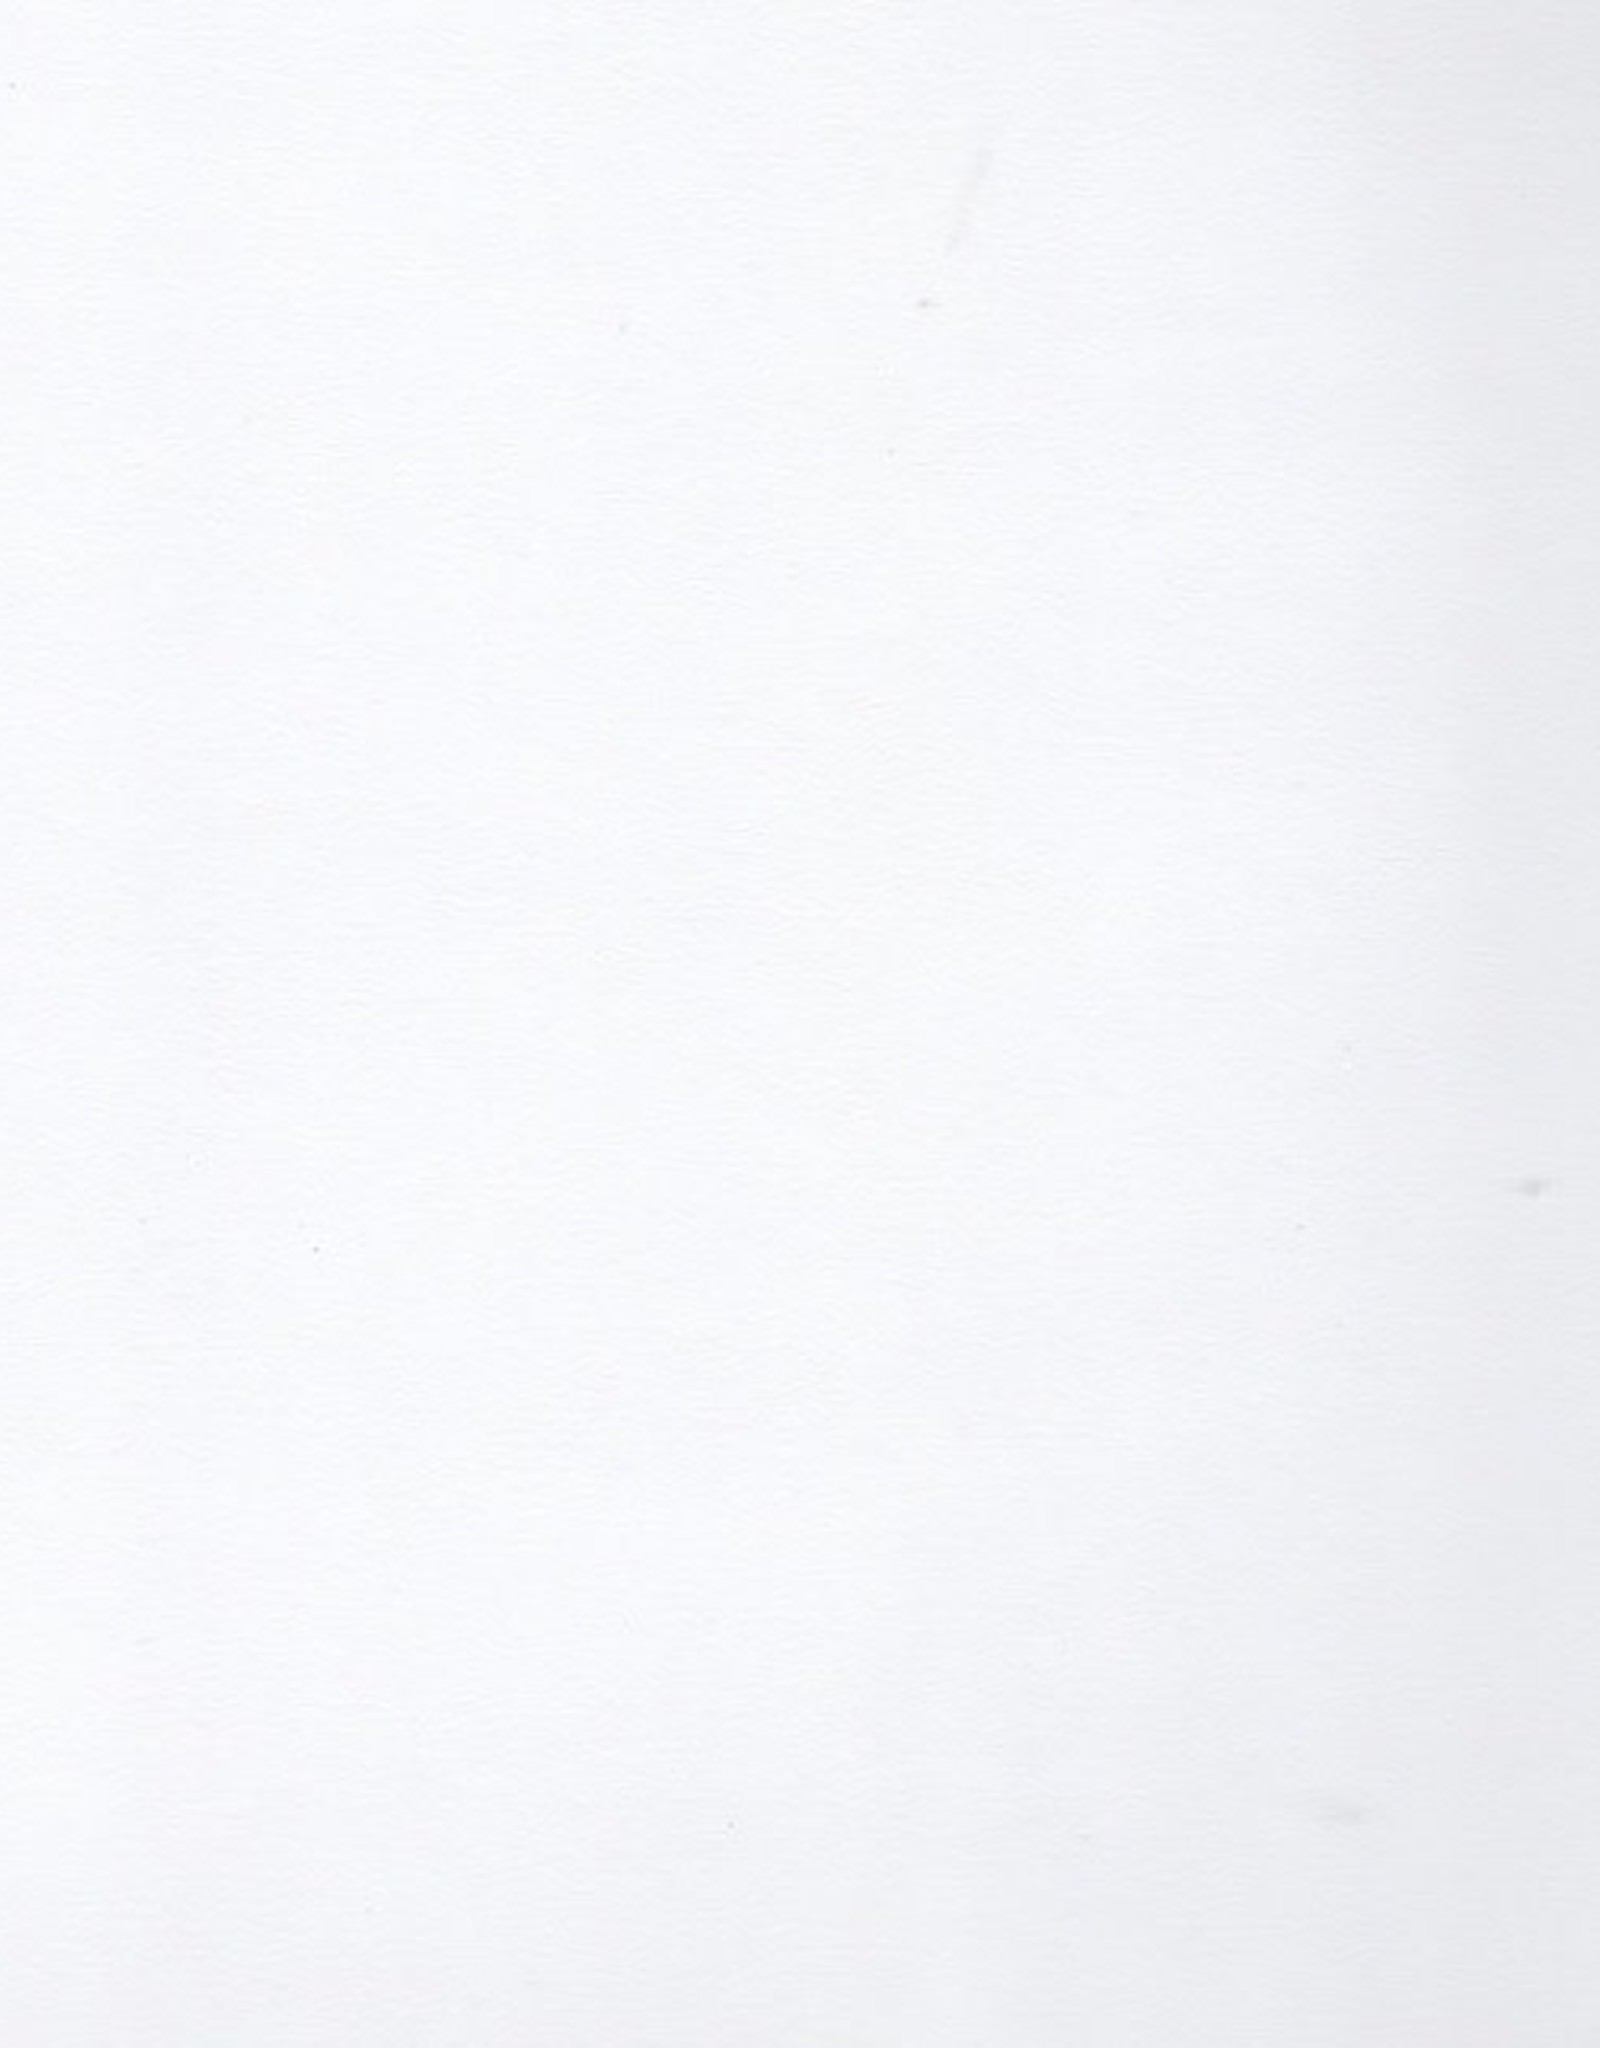 "Radar Paper, 23"" x 35"" 147 gsm, 67# Bright White, Bristol Cover, Vellum Surface"